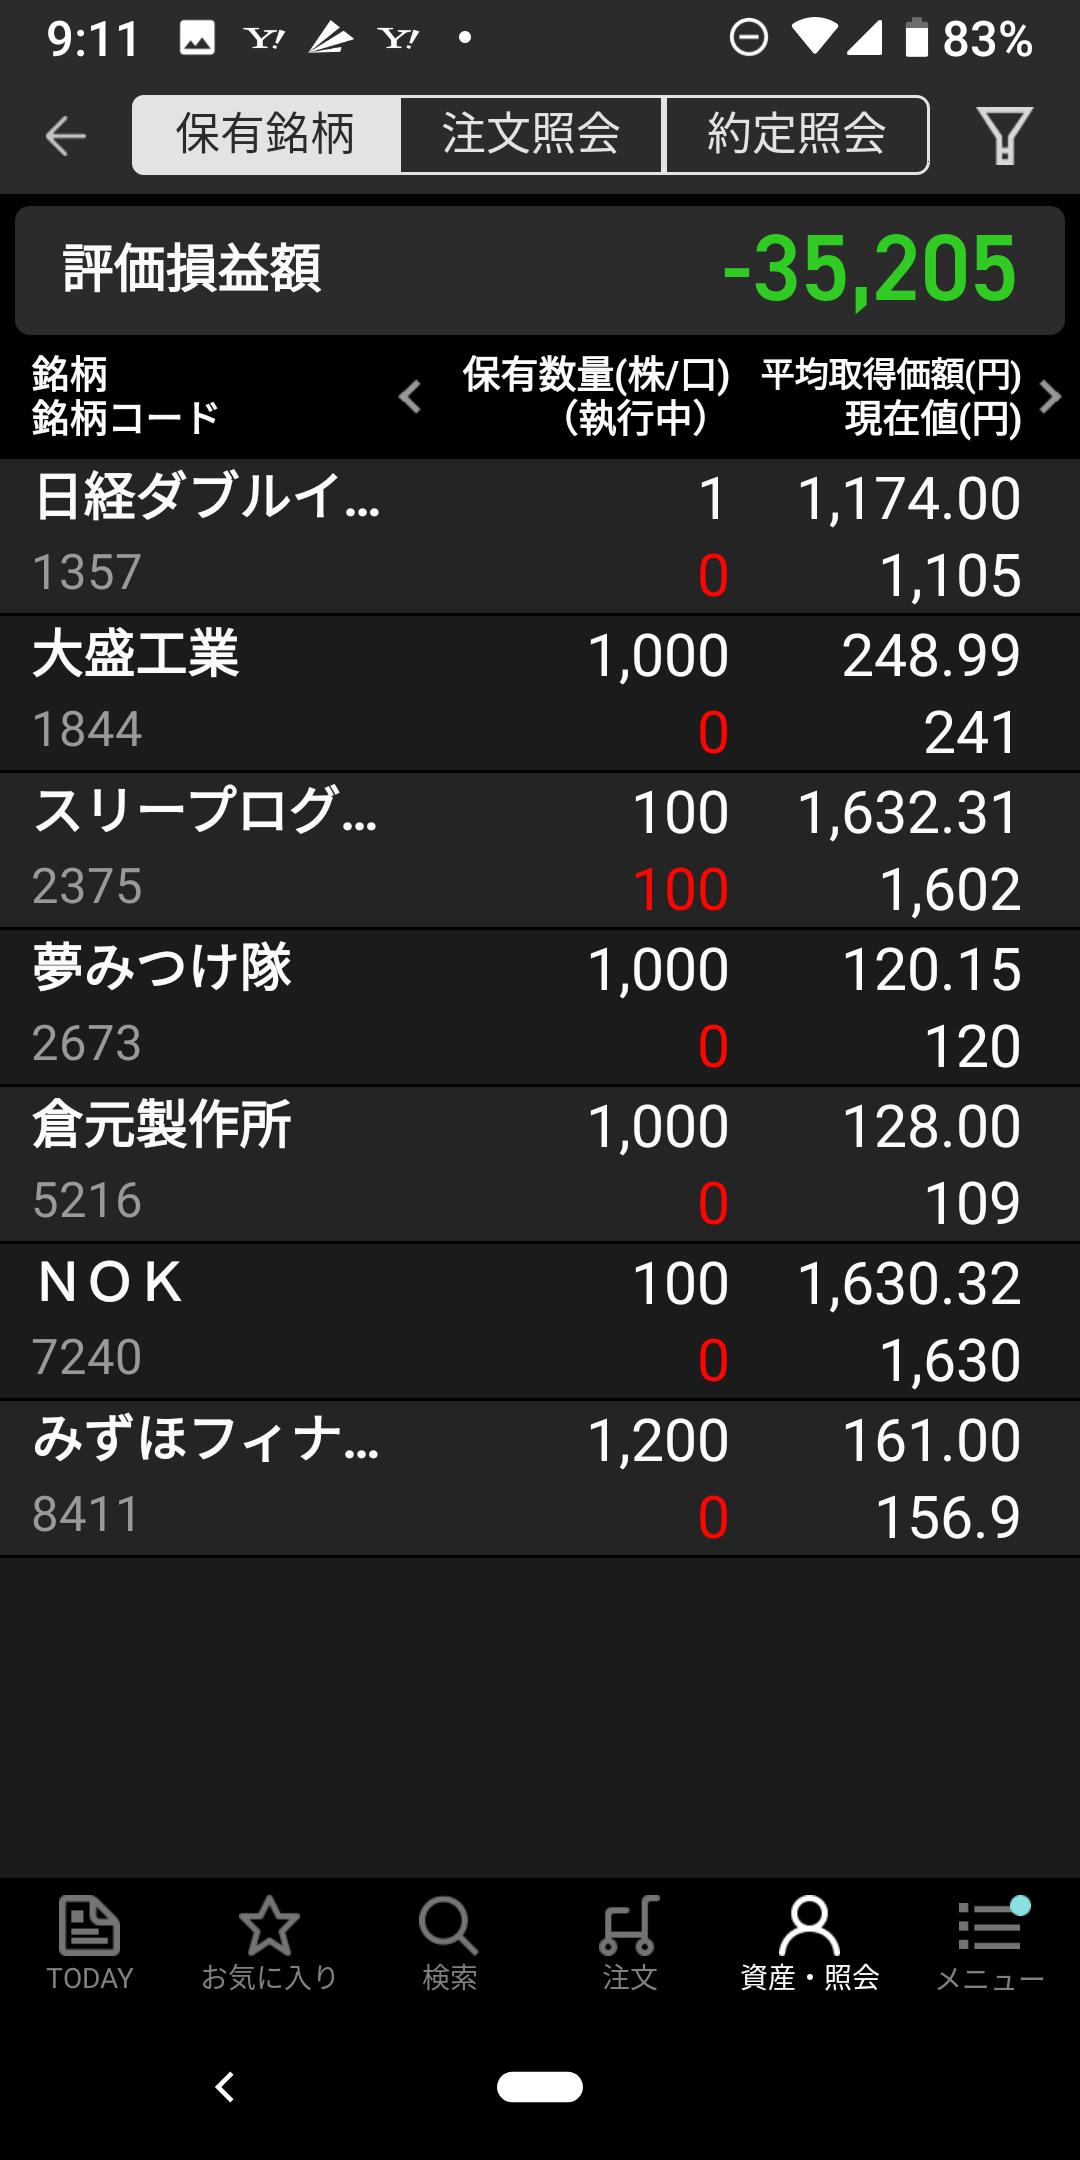 Screenshot (2019_07_04 9_11_37)